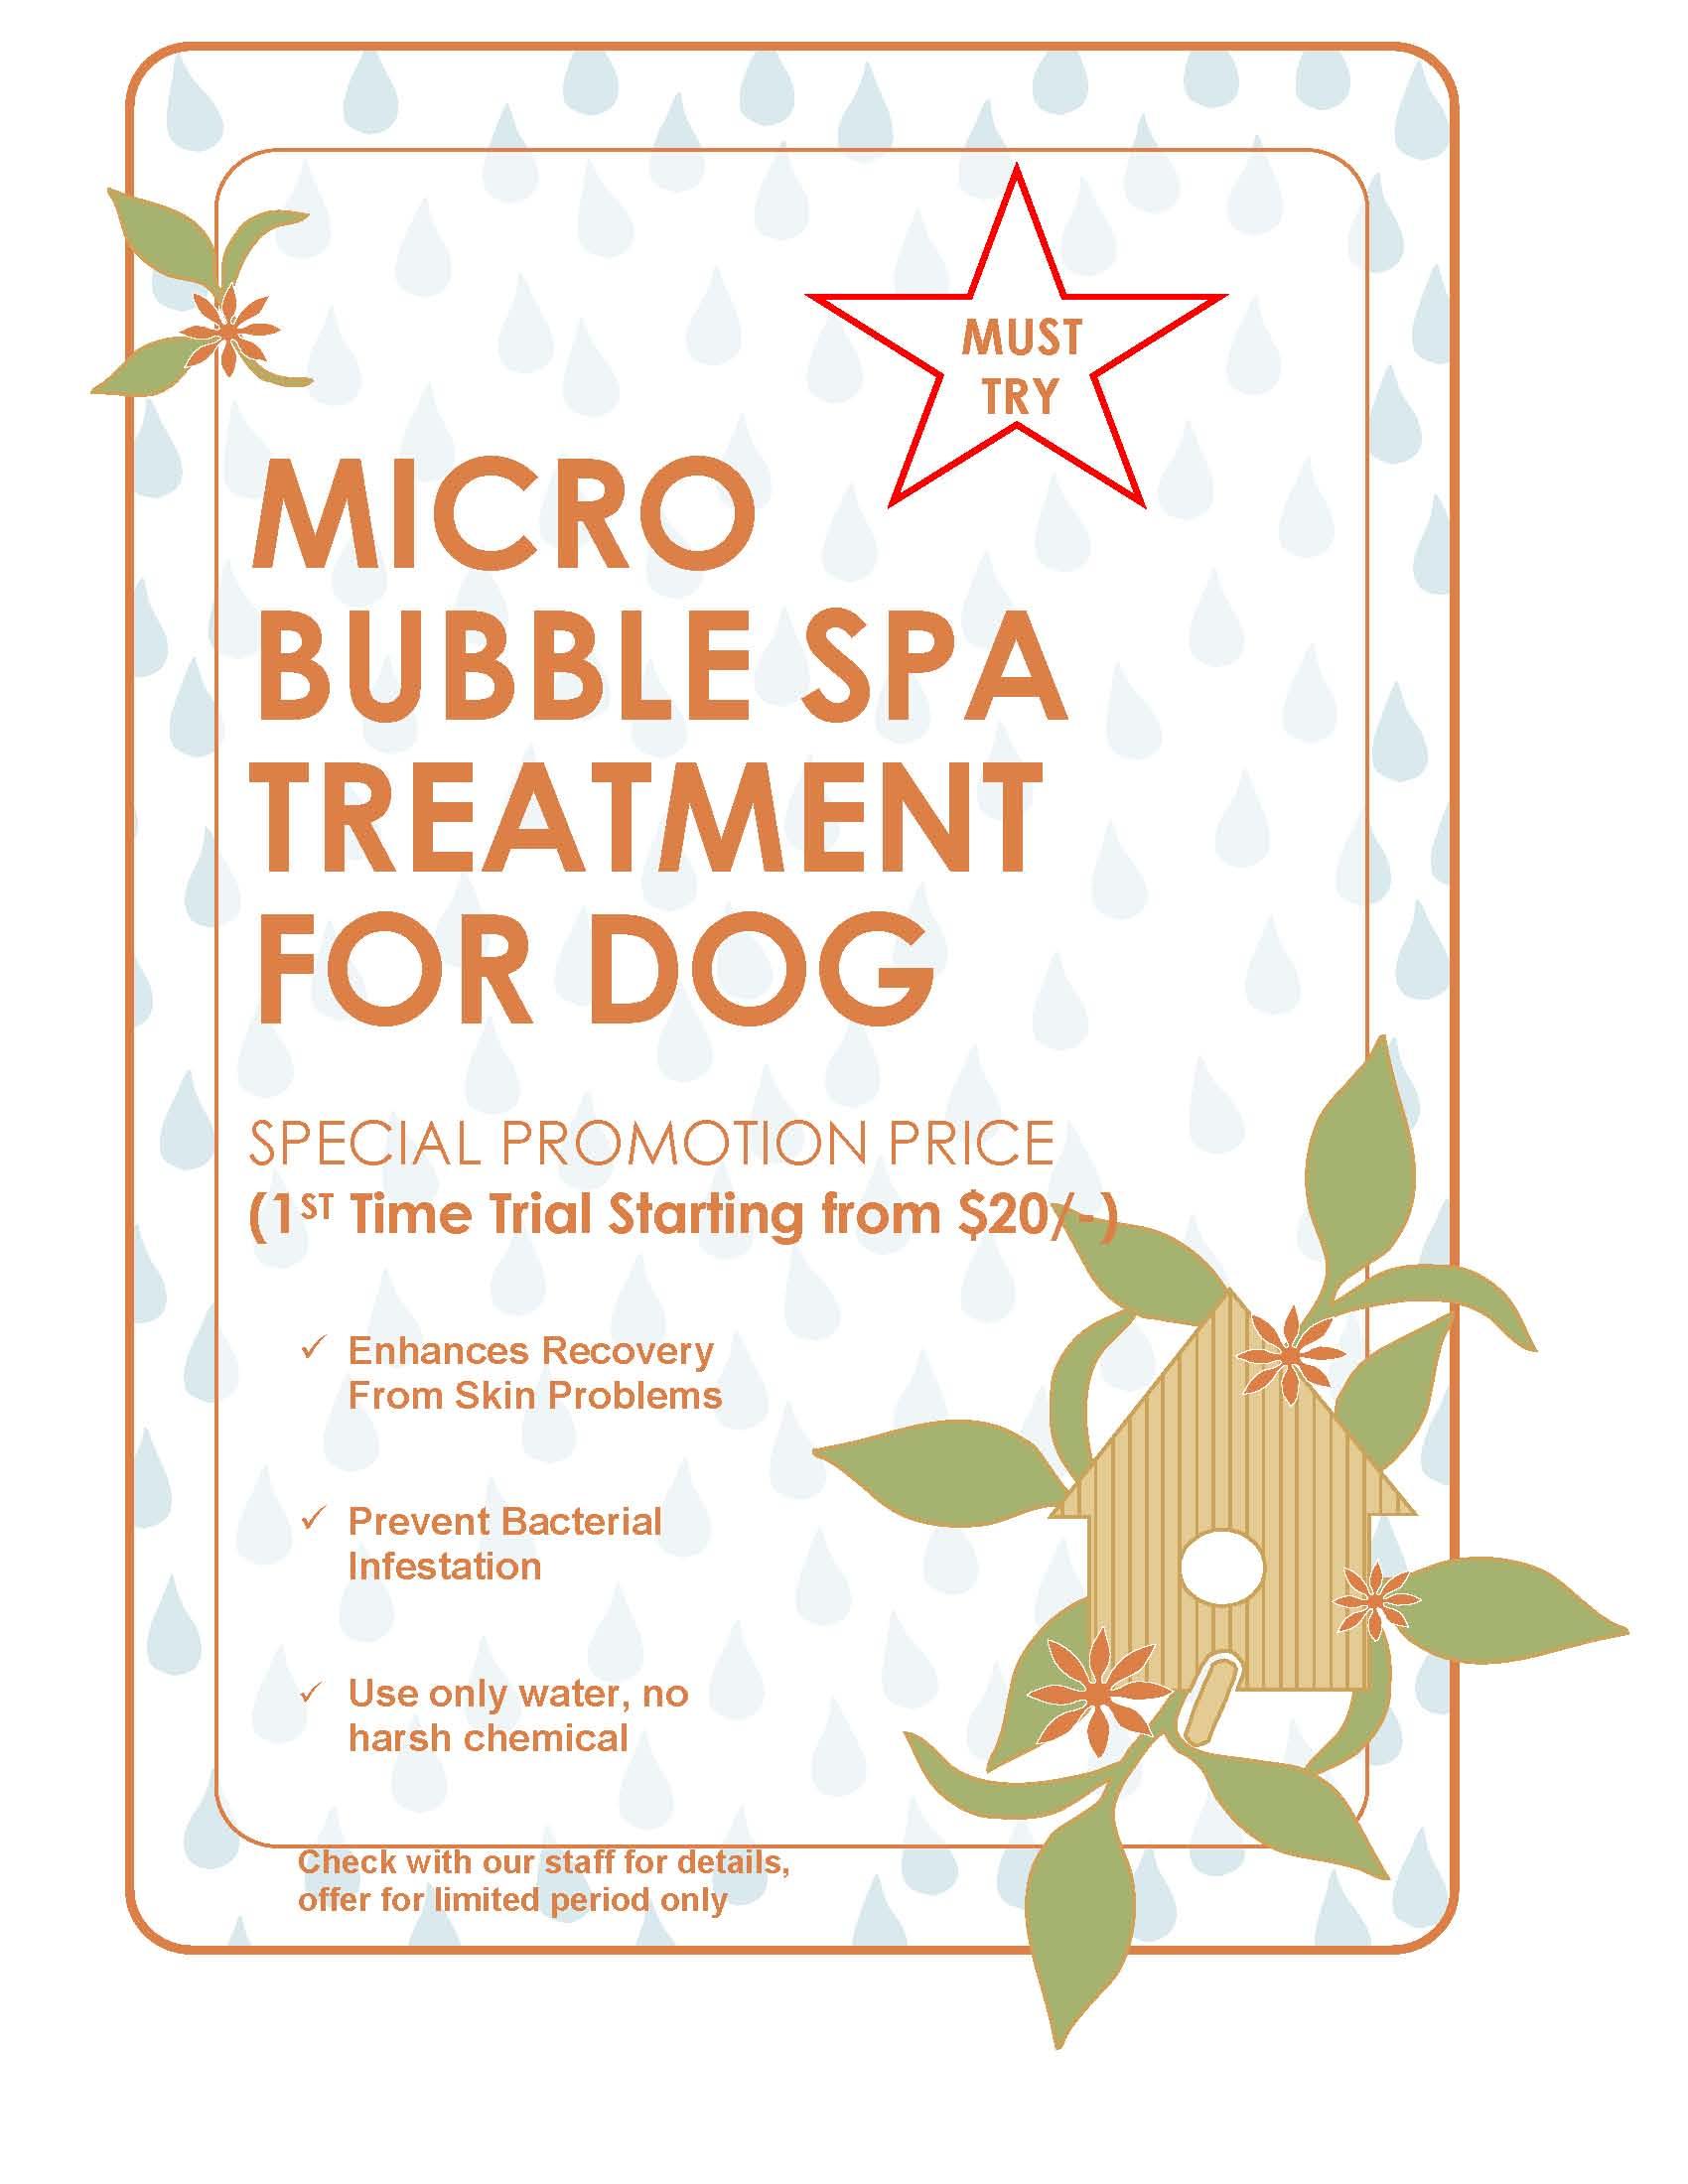 Micro bubble spa treatment for dog 2014